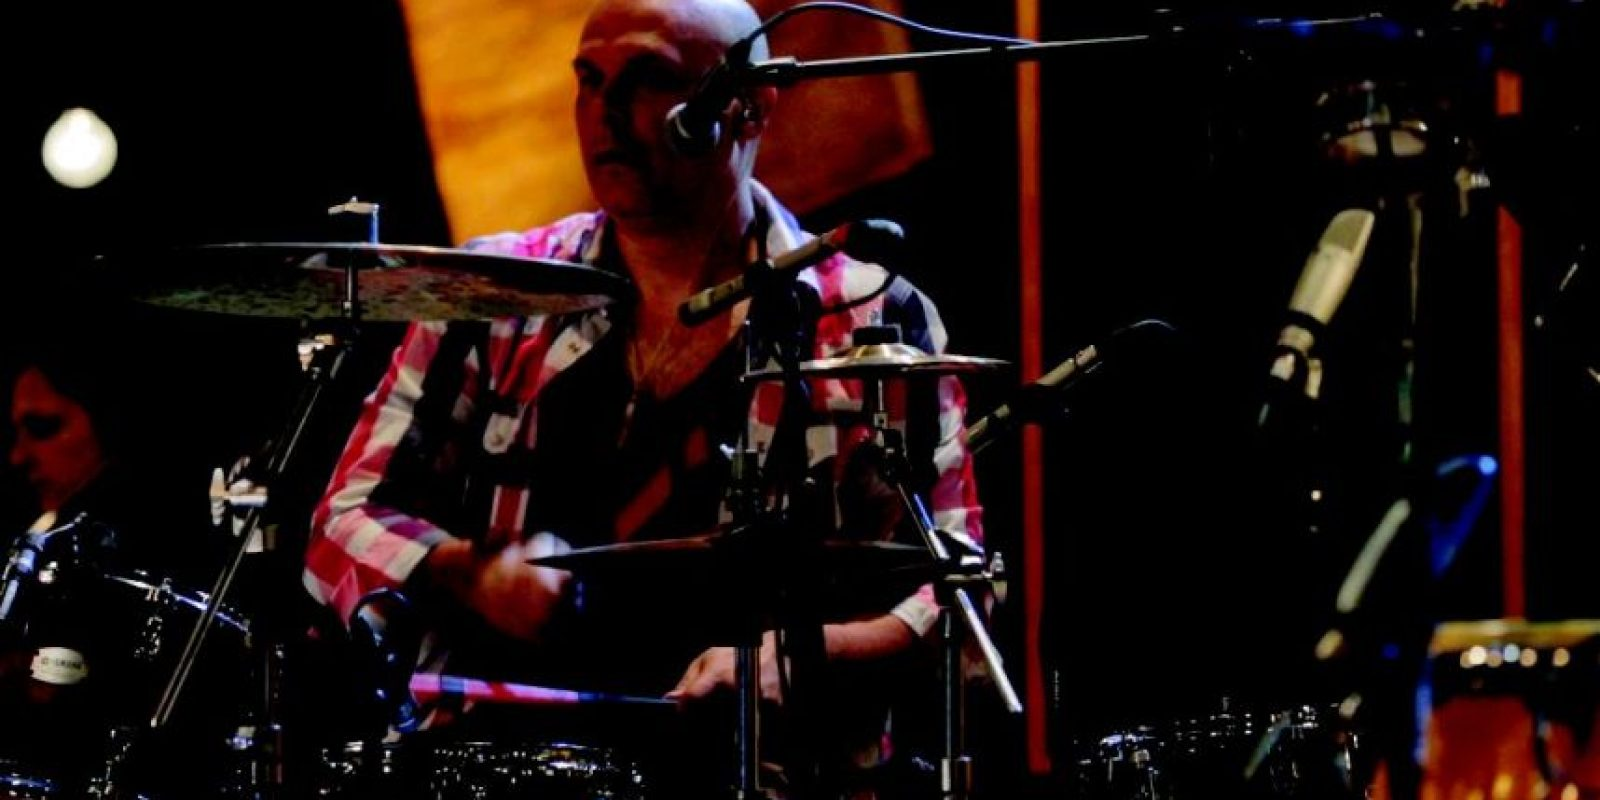 Juan Mauel Roura (Mamel) Foto:Cortesía